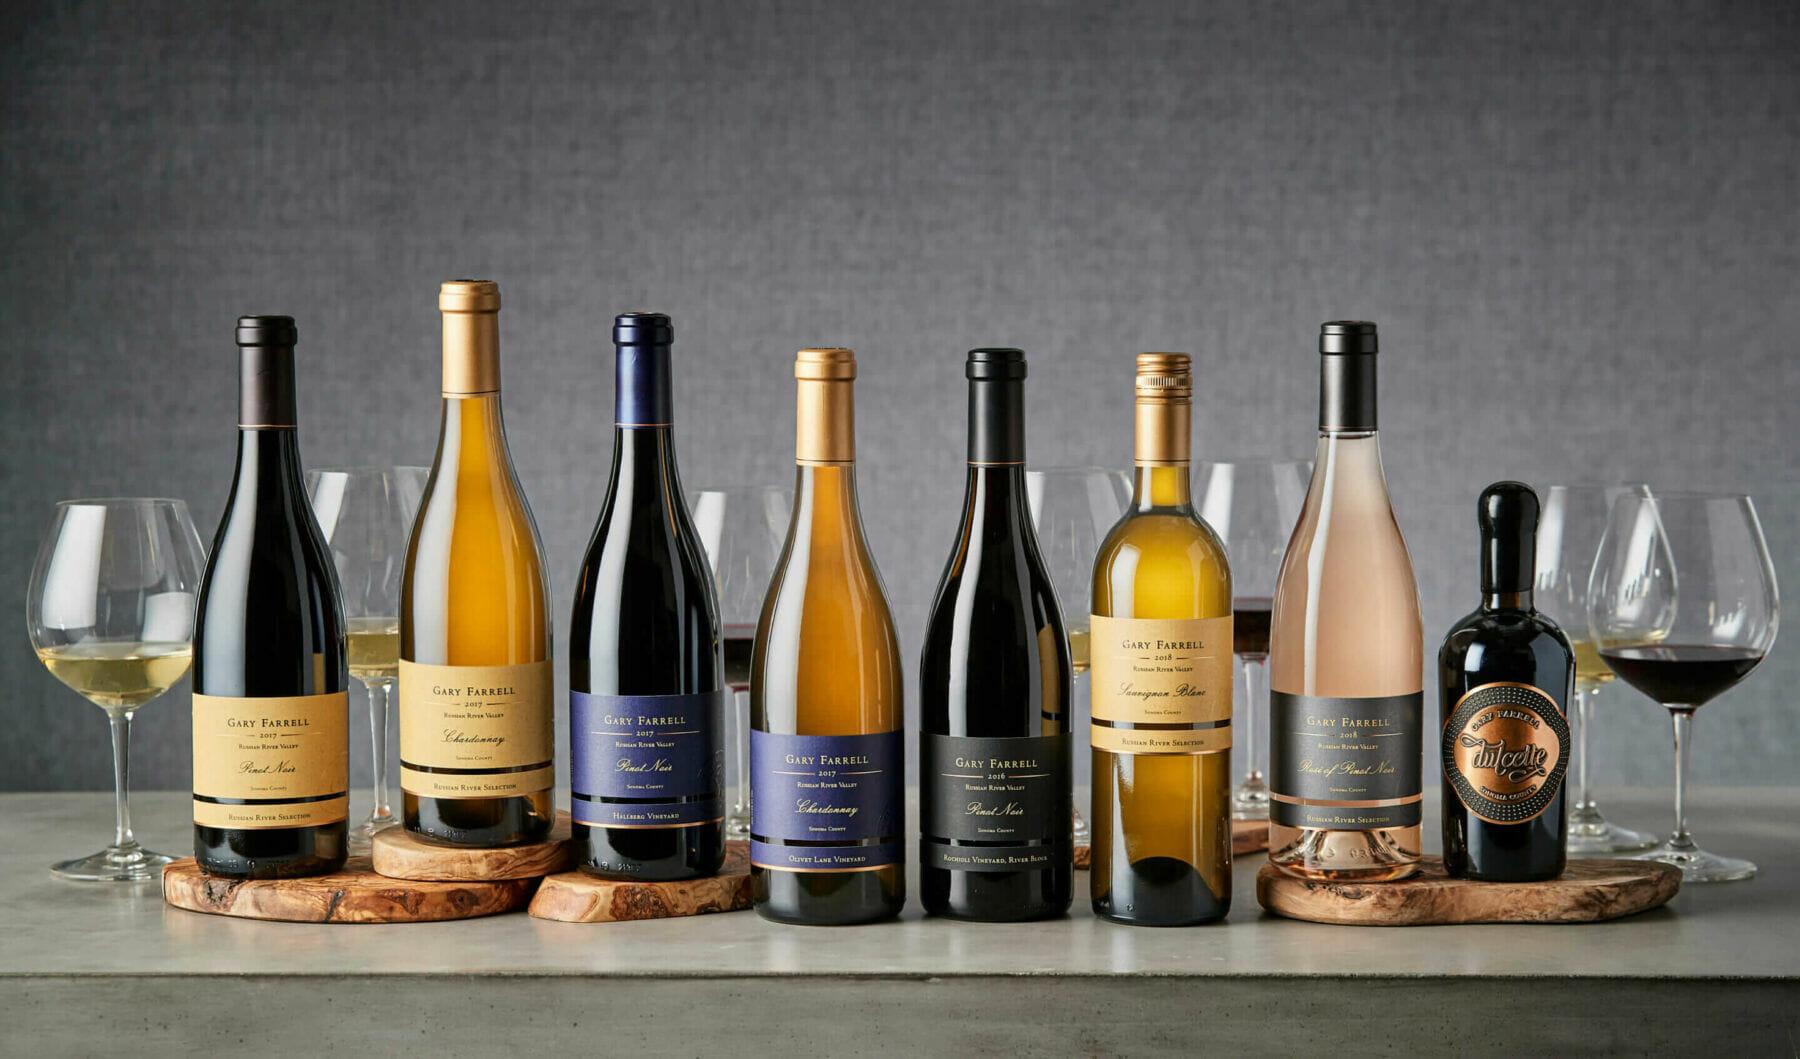 Gary Farrell Family of Wines